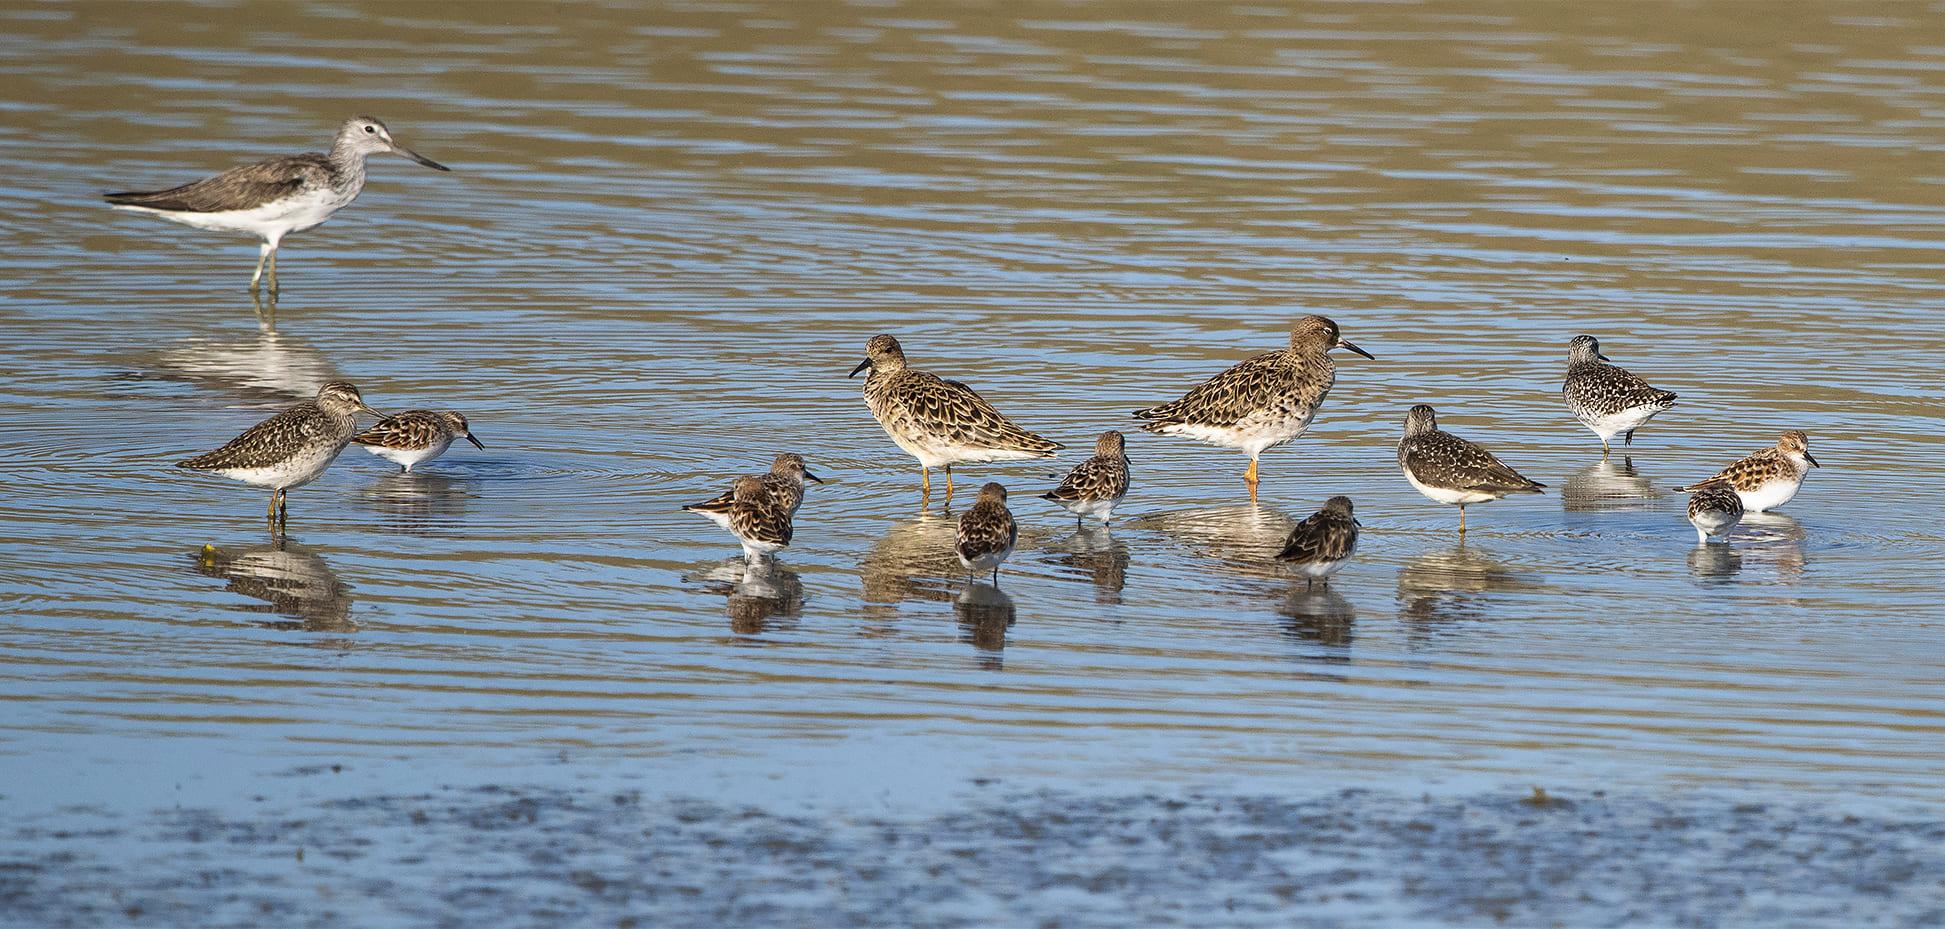 Shorebirds on a mudflat